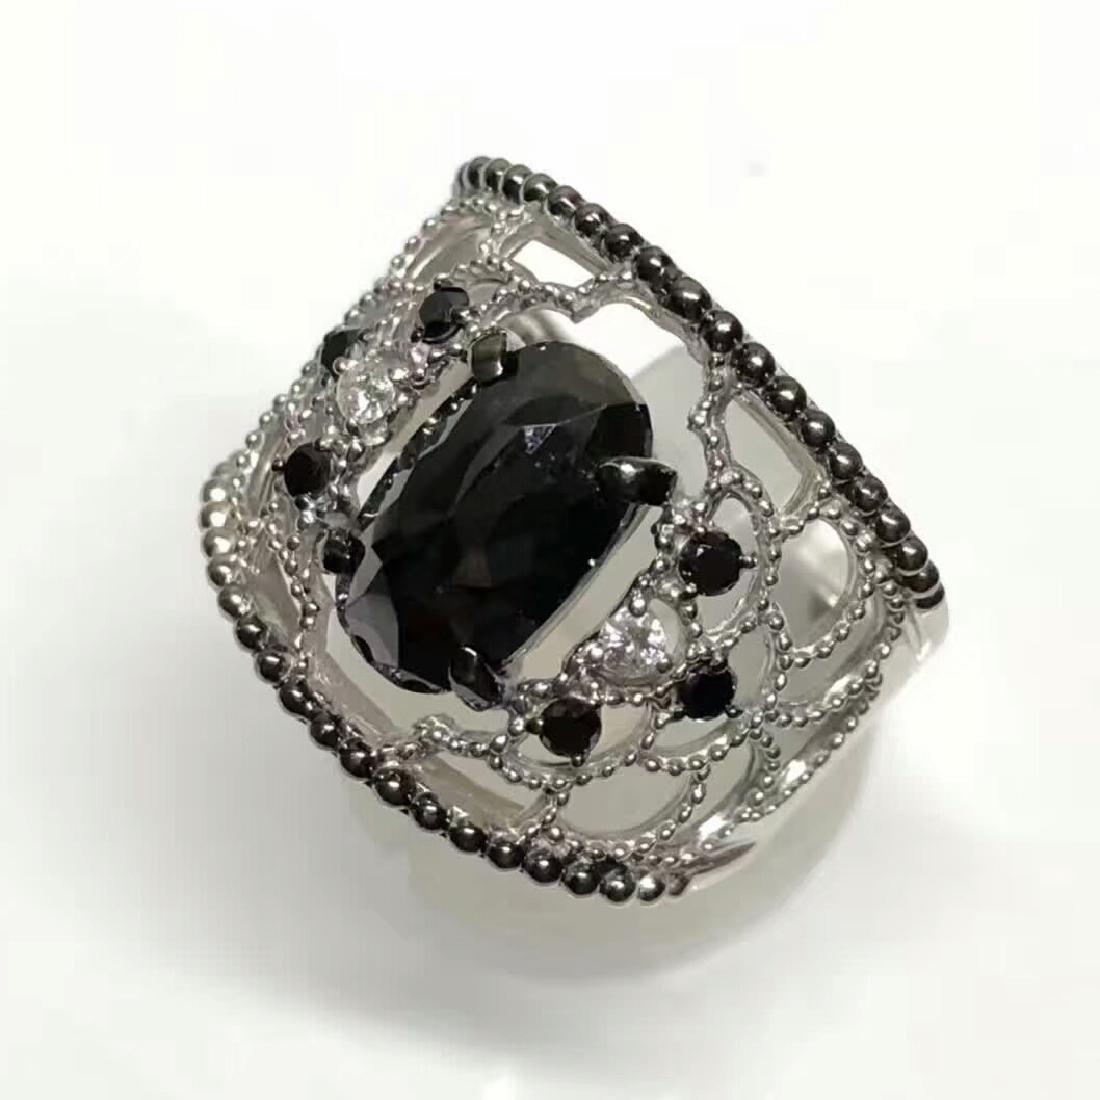 3.16ct Black Diamond Ring in 18kt White Gold - 5